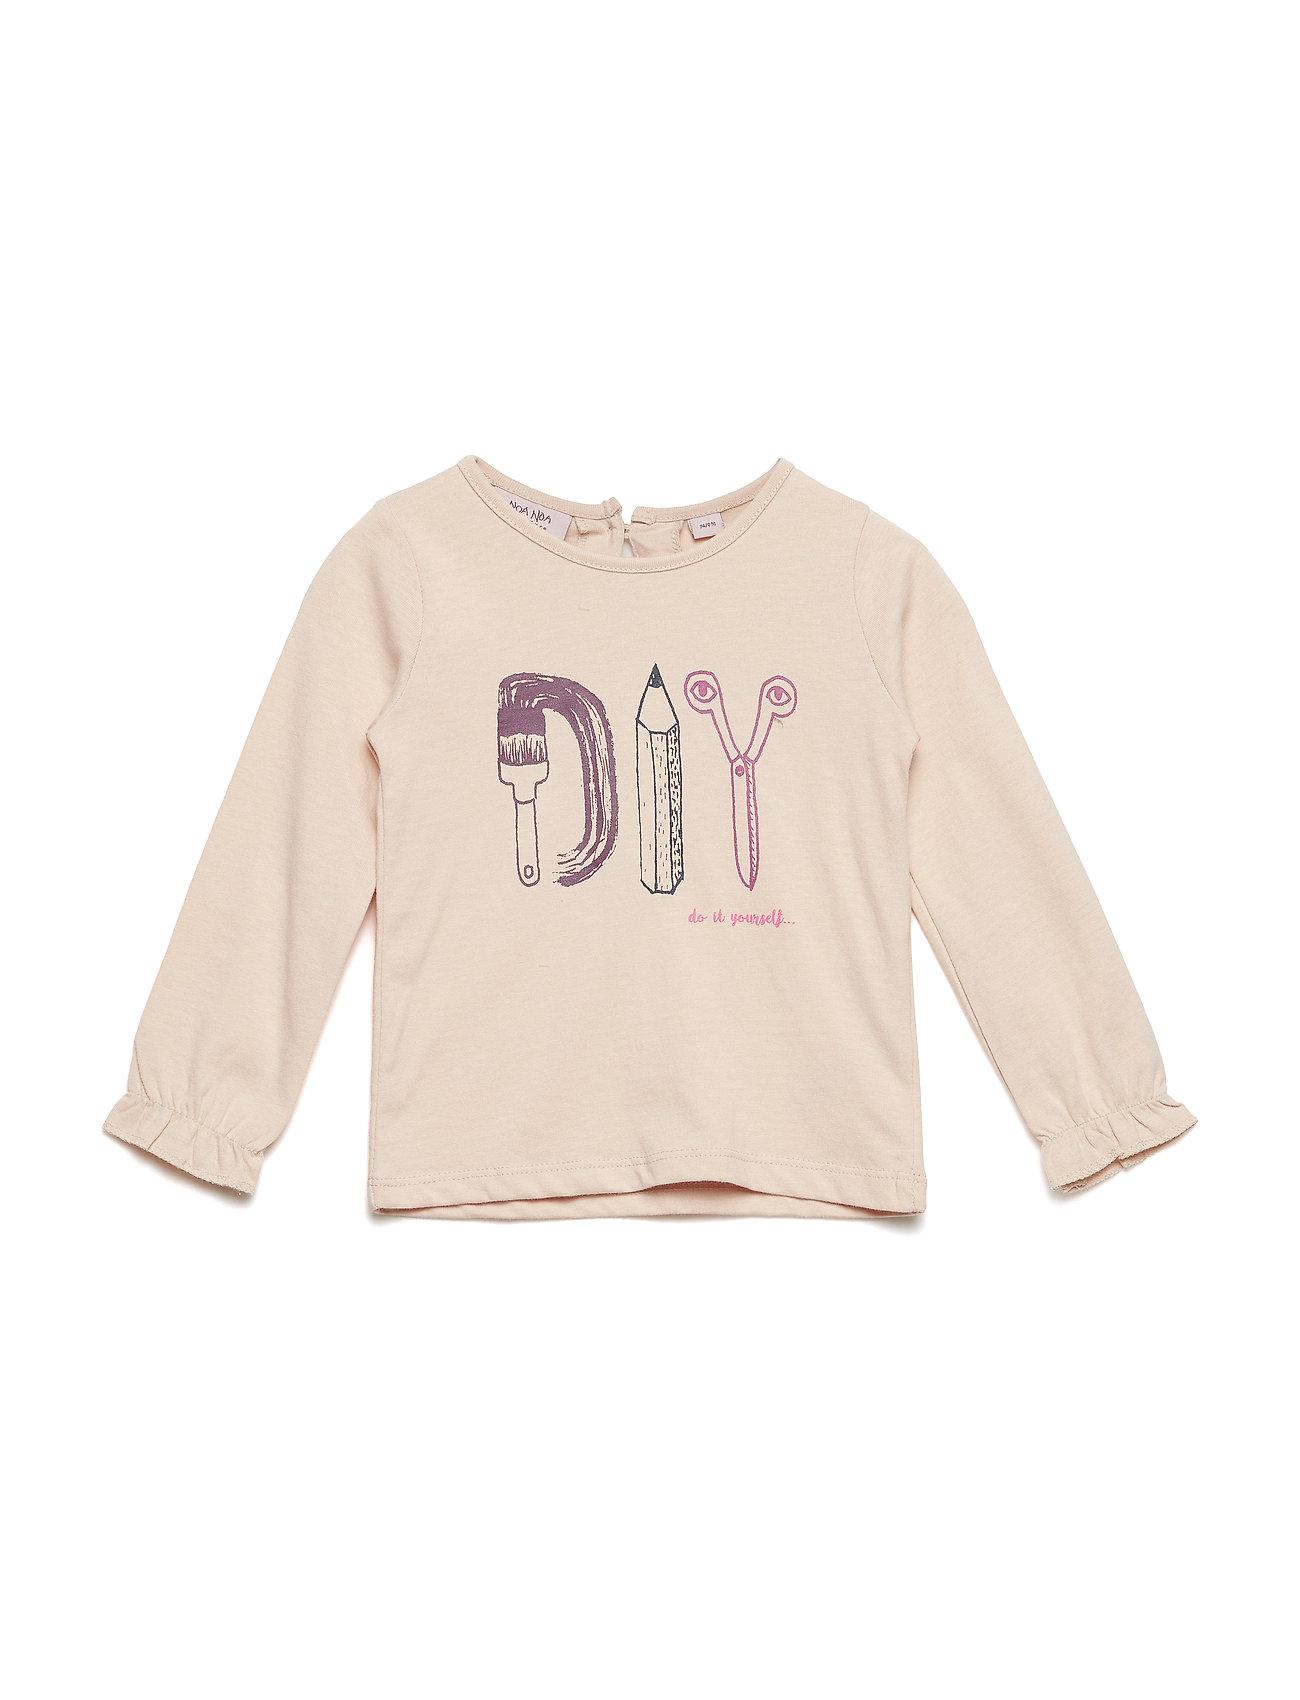 Noa Noa Miniature T-shirt - CAMEO ROSE